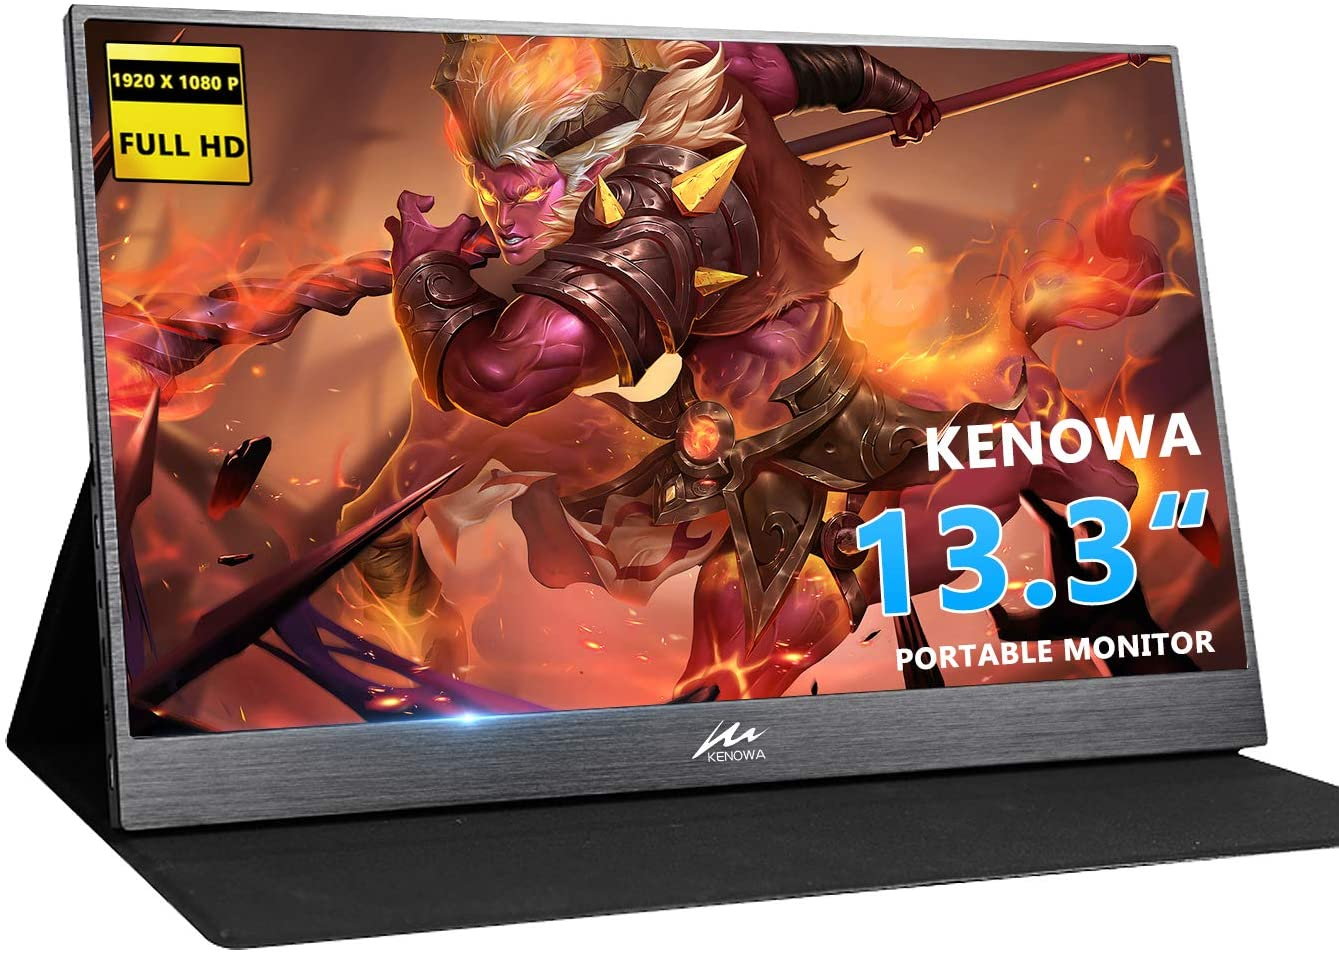 "Kenowa 13.3"" Type-C Portable Monitor Full HD 1920 x 1080 LED IPS Gaming Monitor with Port HDMI USB C for Raspberry Pi PS3 PS4 Xbox Ninetendo Mini PC MAC Laptop Display"